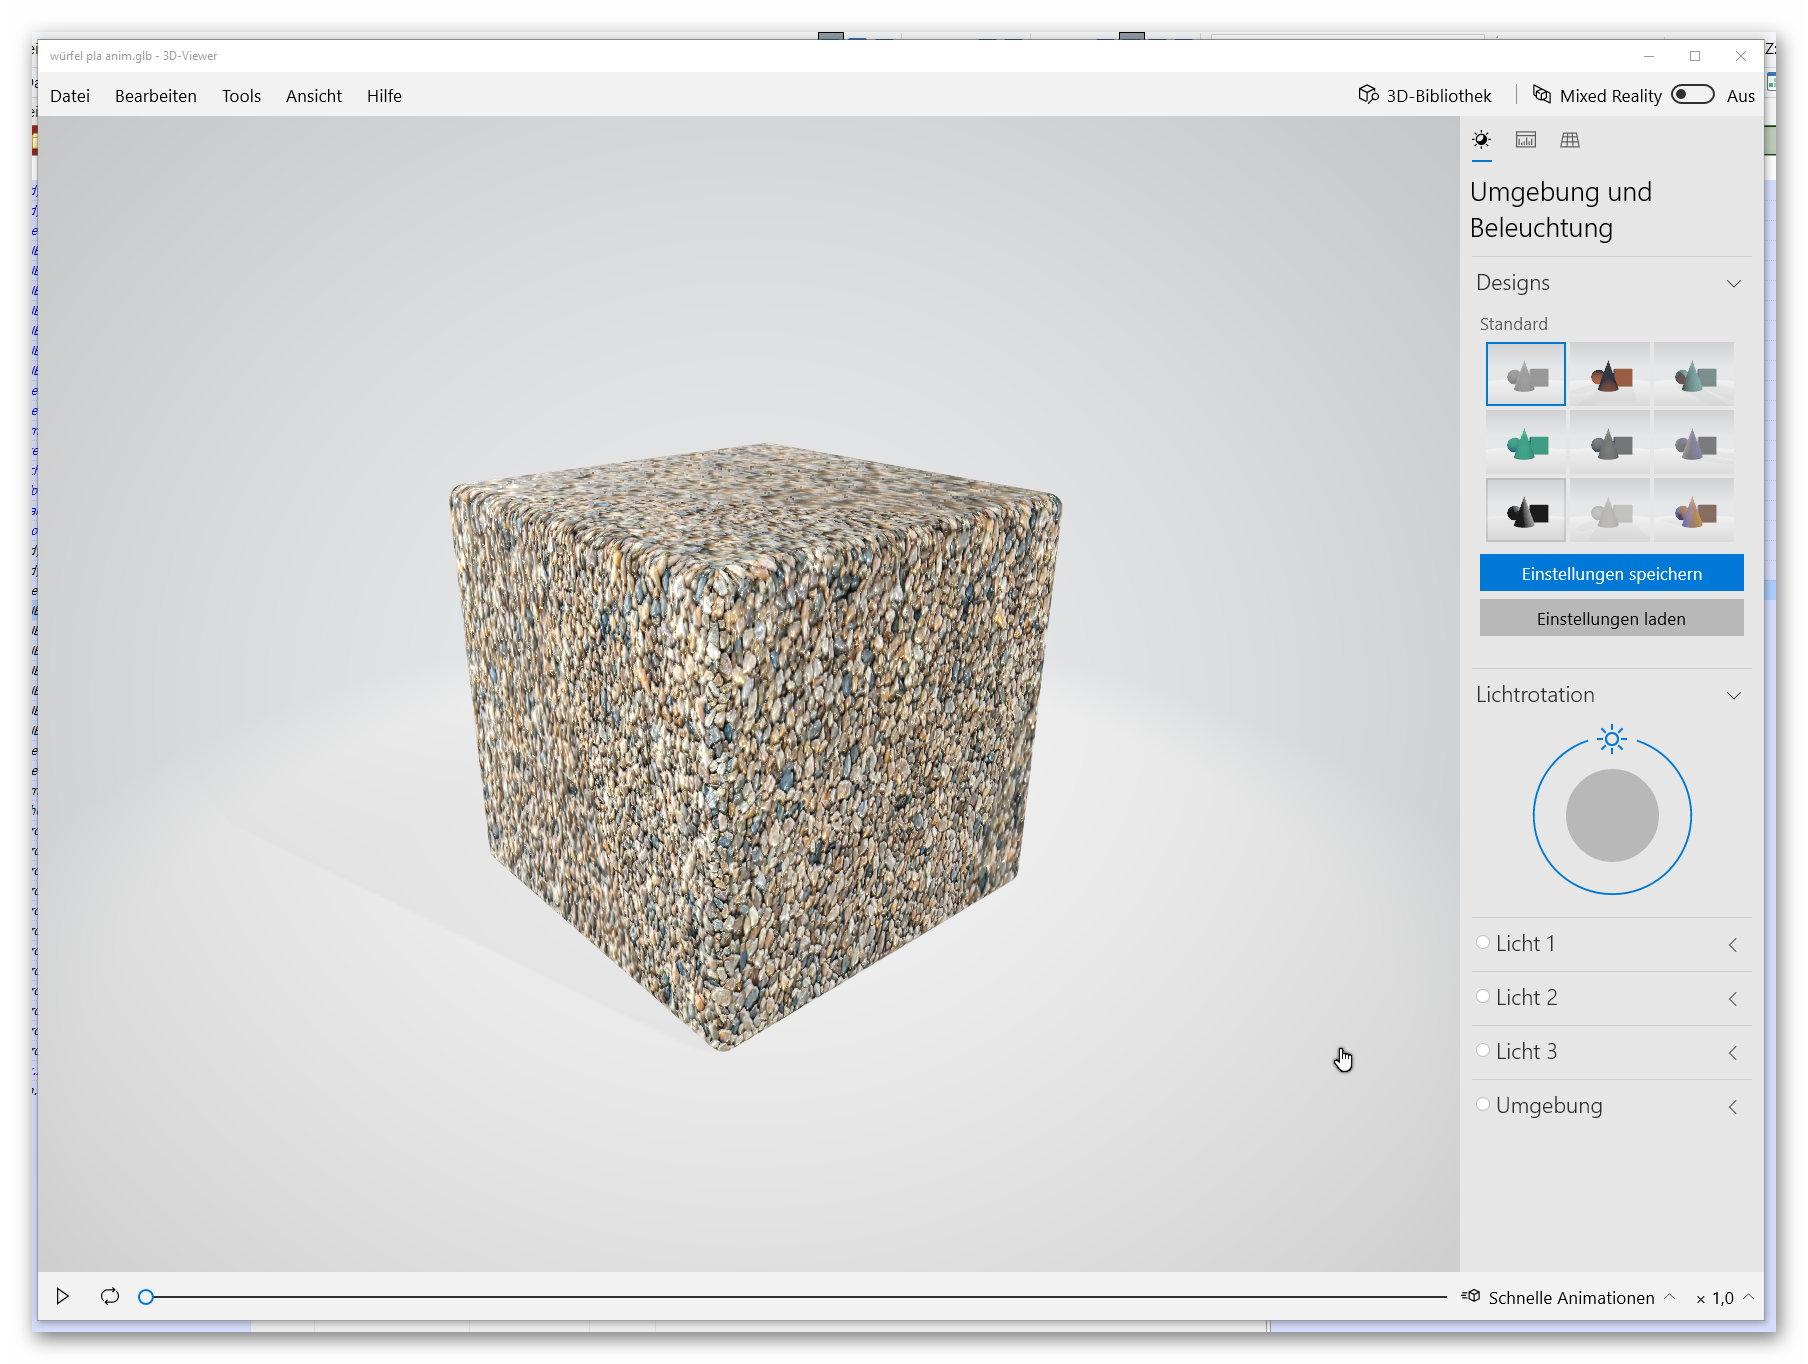 3D Object preview (3mf, fbx, glb, gltf, obj, ply, stl) - Viewer/VFS